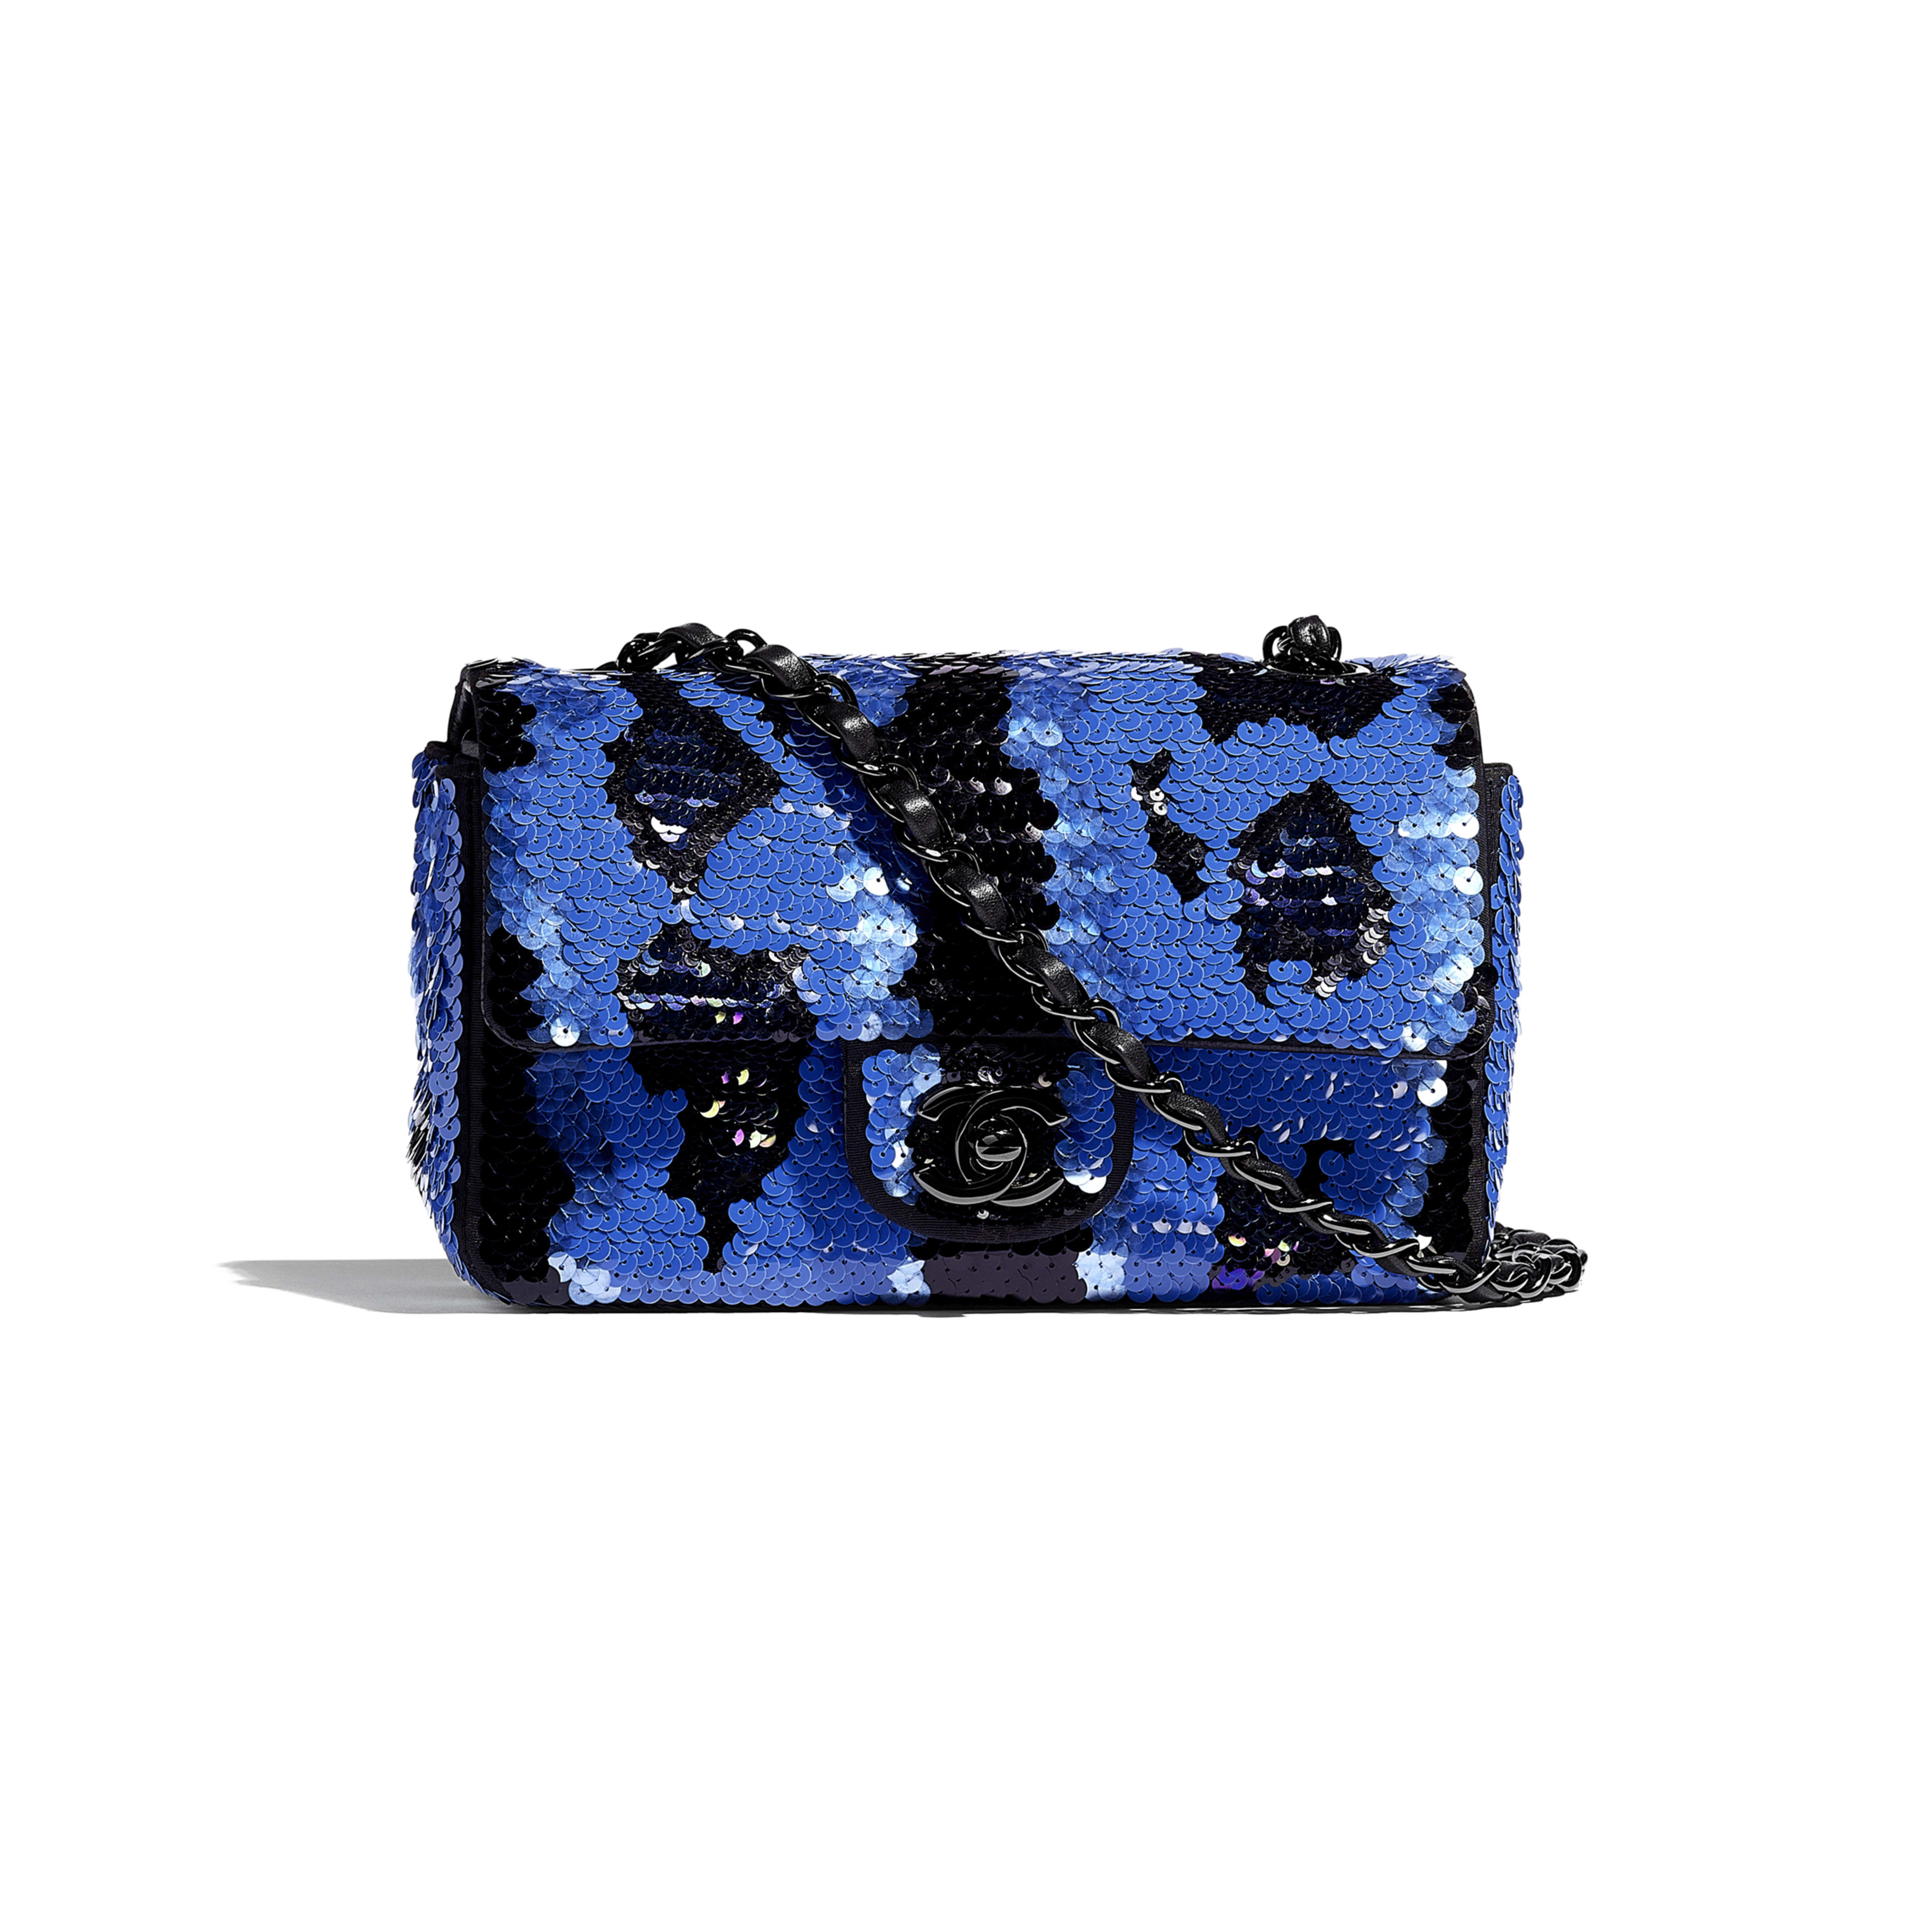 Mini Flap Bag - Blue & Black - Sequins & Black Metal - Default view - see full sized version